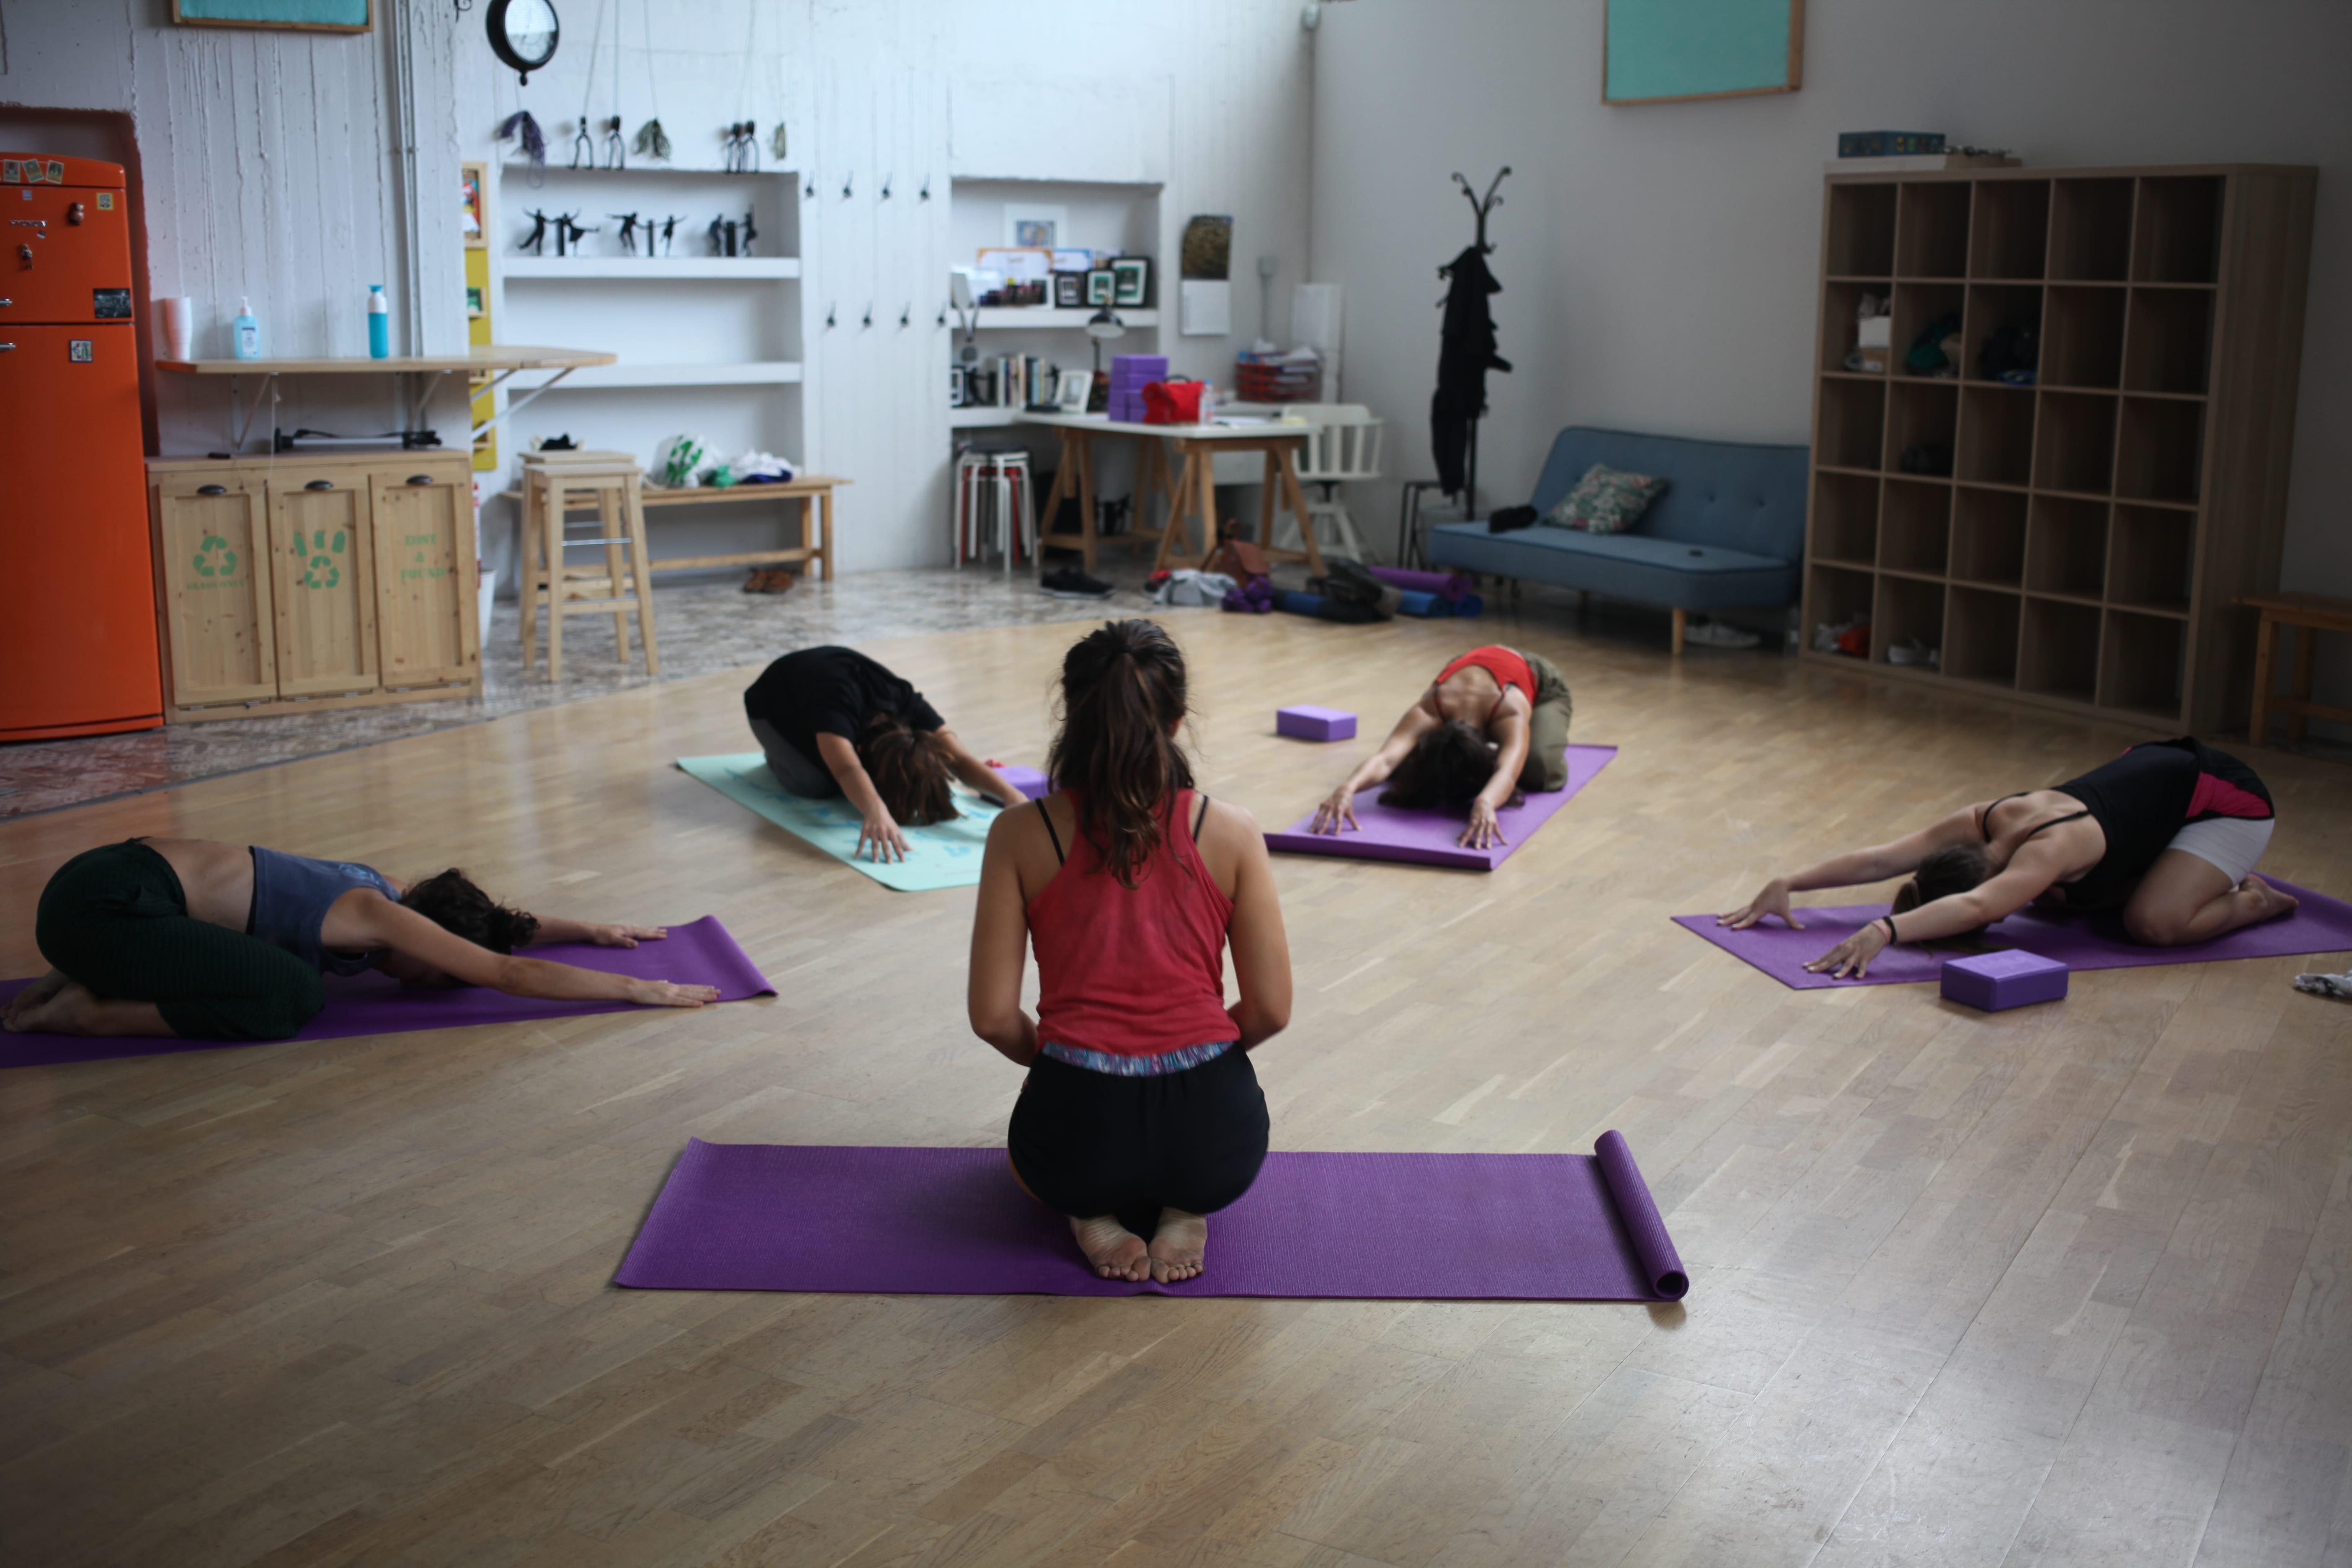 ram yoga, fabrica athens, τεχνοχώρος φάμπρικα, μαθήματα yoga, nada yoga, yenger yoga, hatha yoga, fabrica lab, giovanna michaliadi sarti